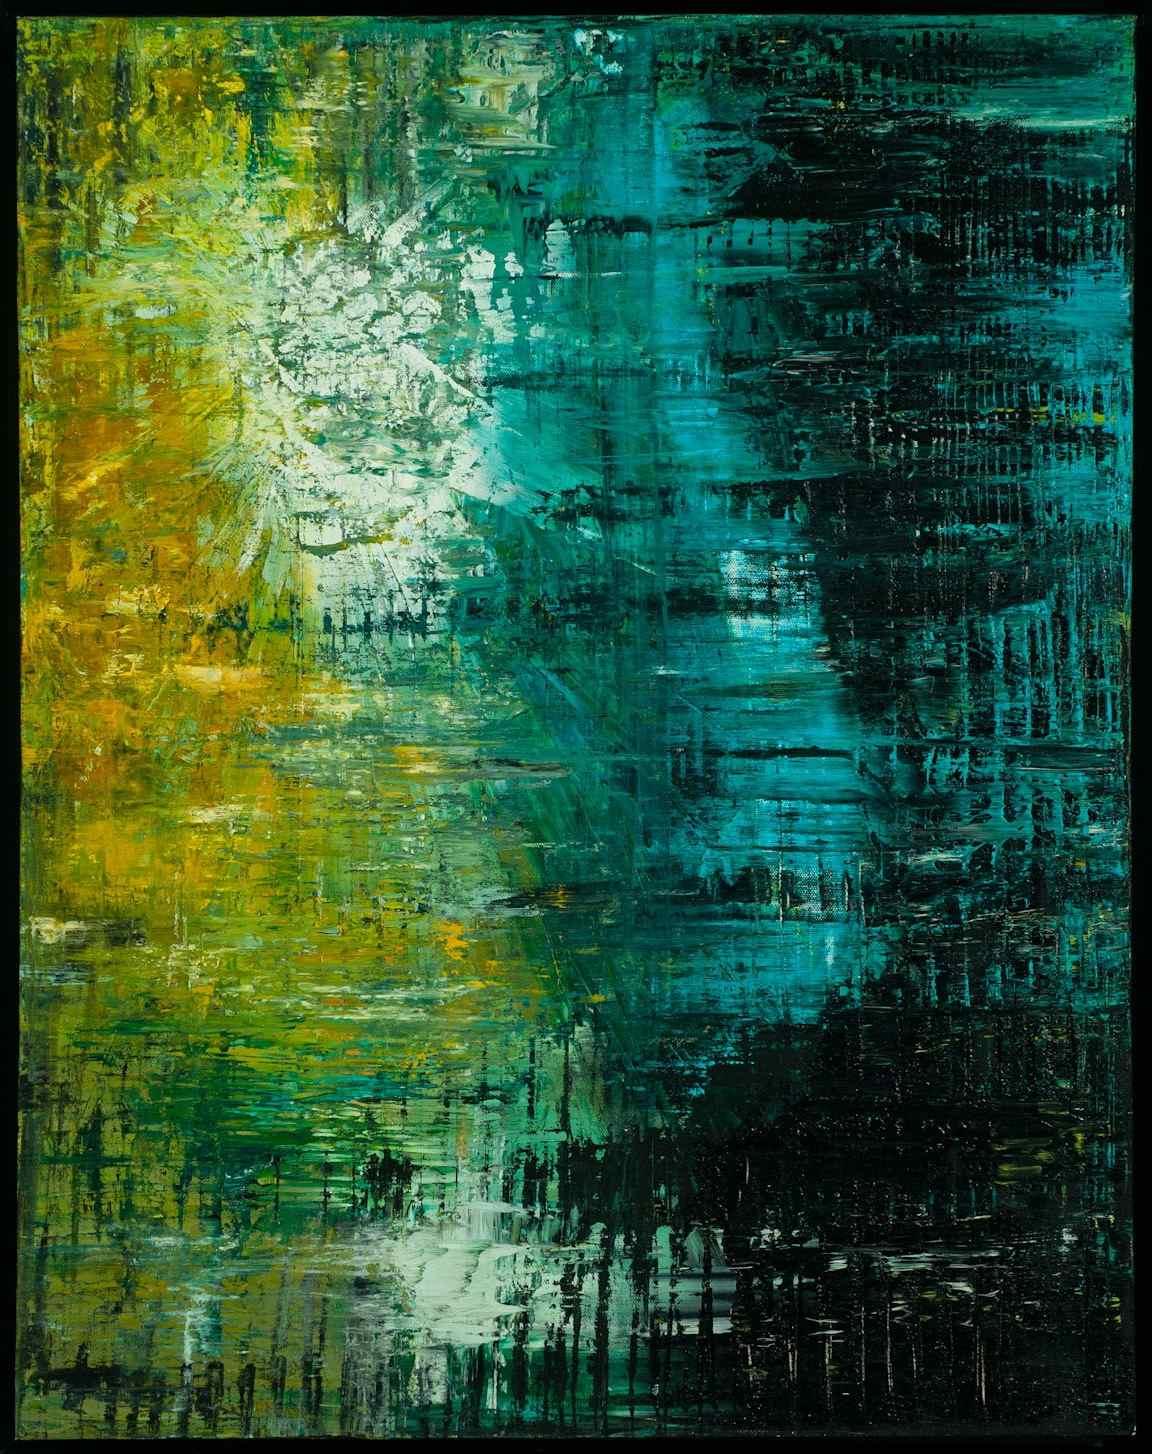 Jill S. Krutick, LADY LIBERTY,Oil on canvas, 30 x 24 inches, (76.2 x 61.0 cm).